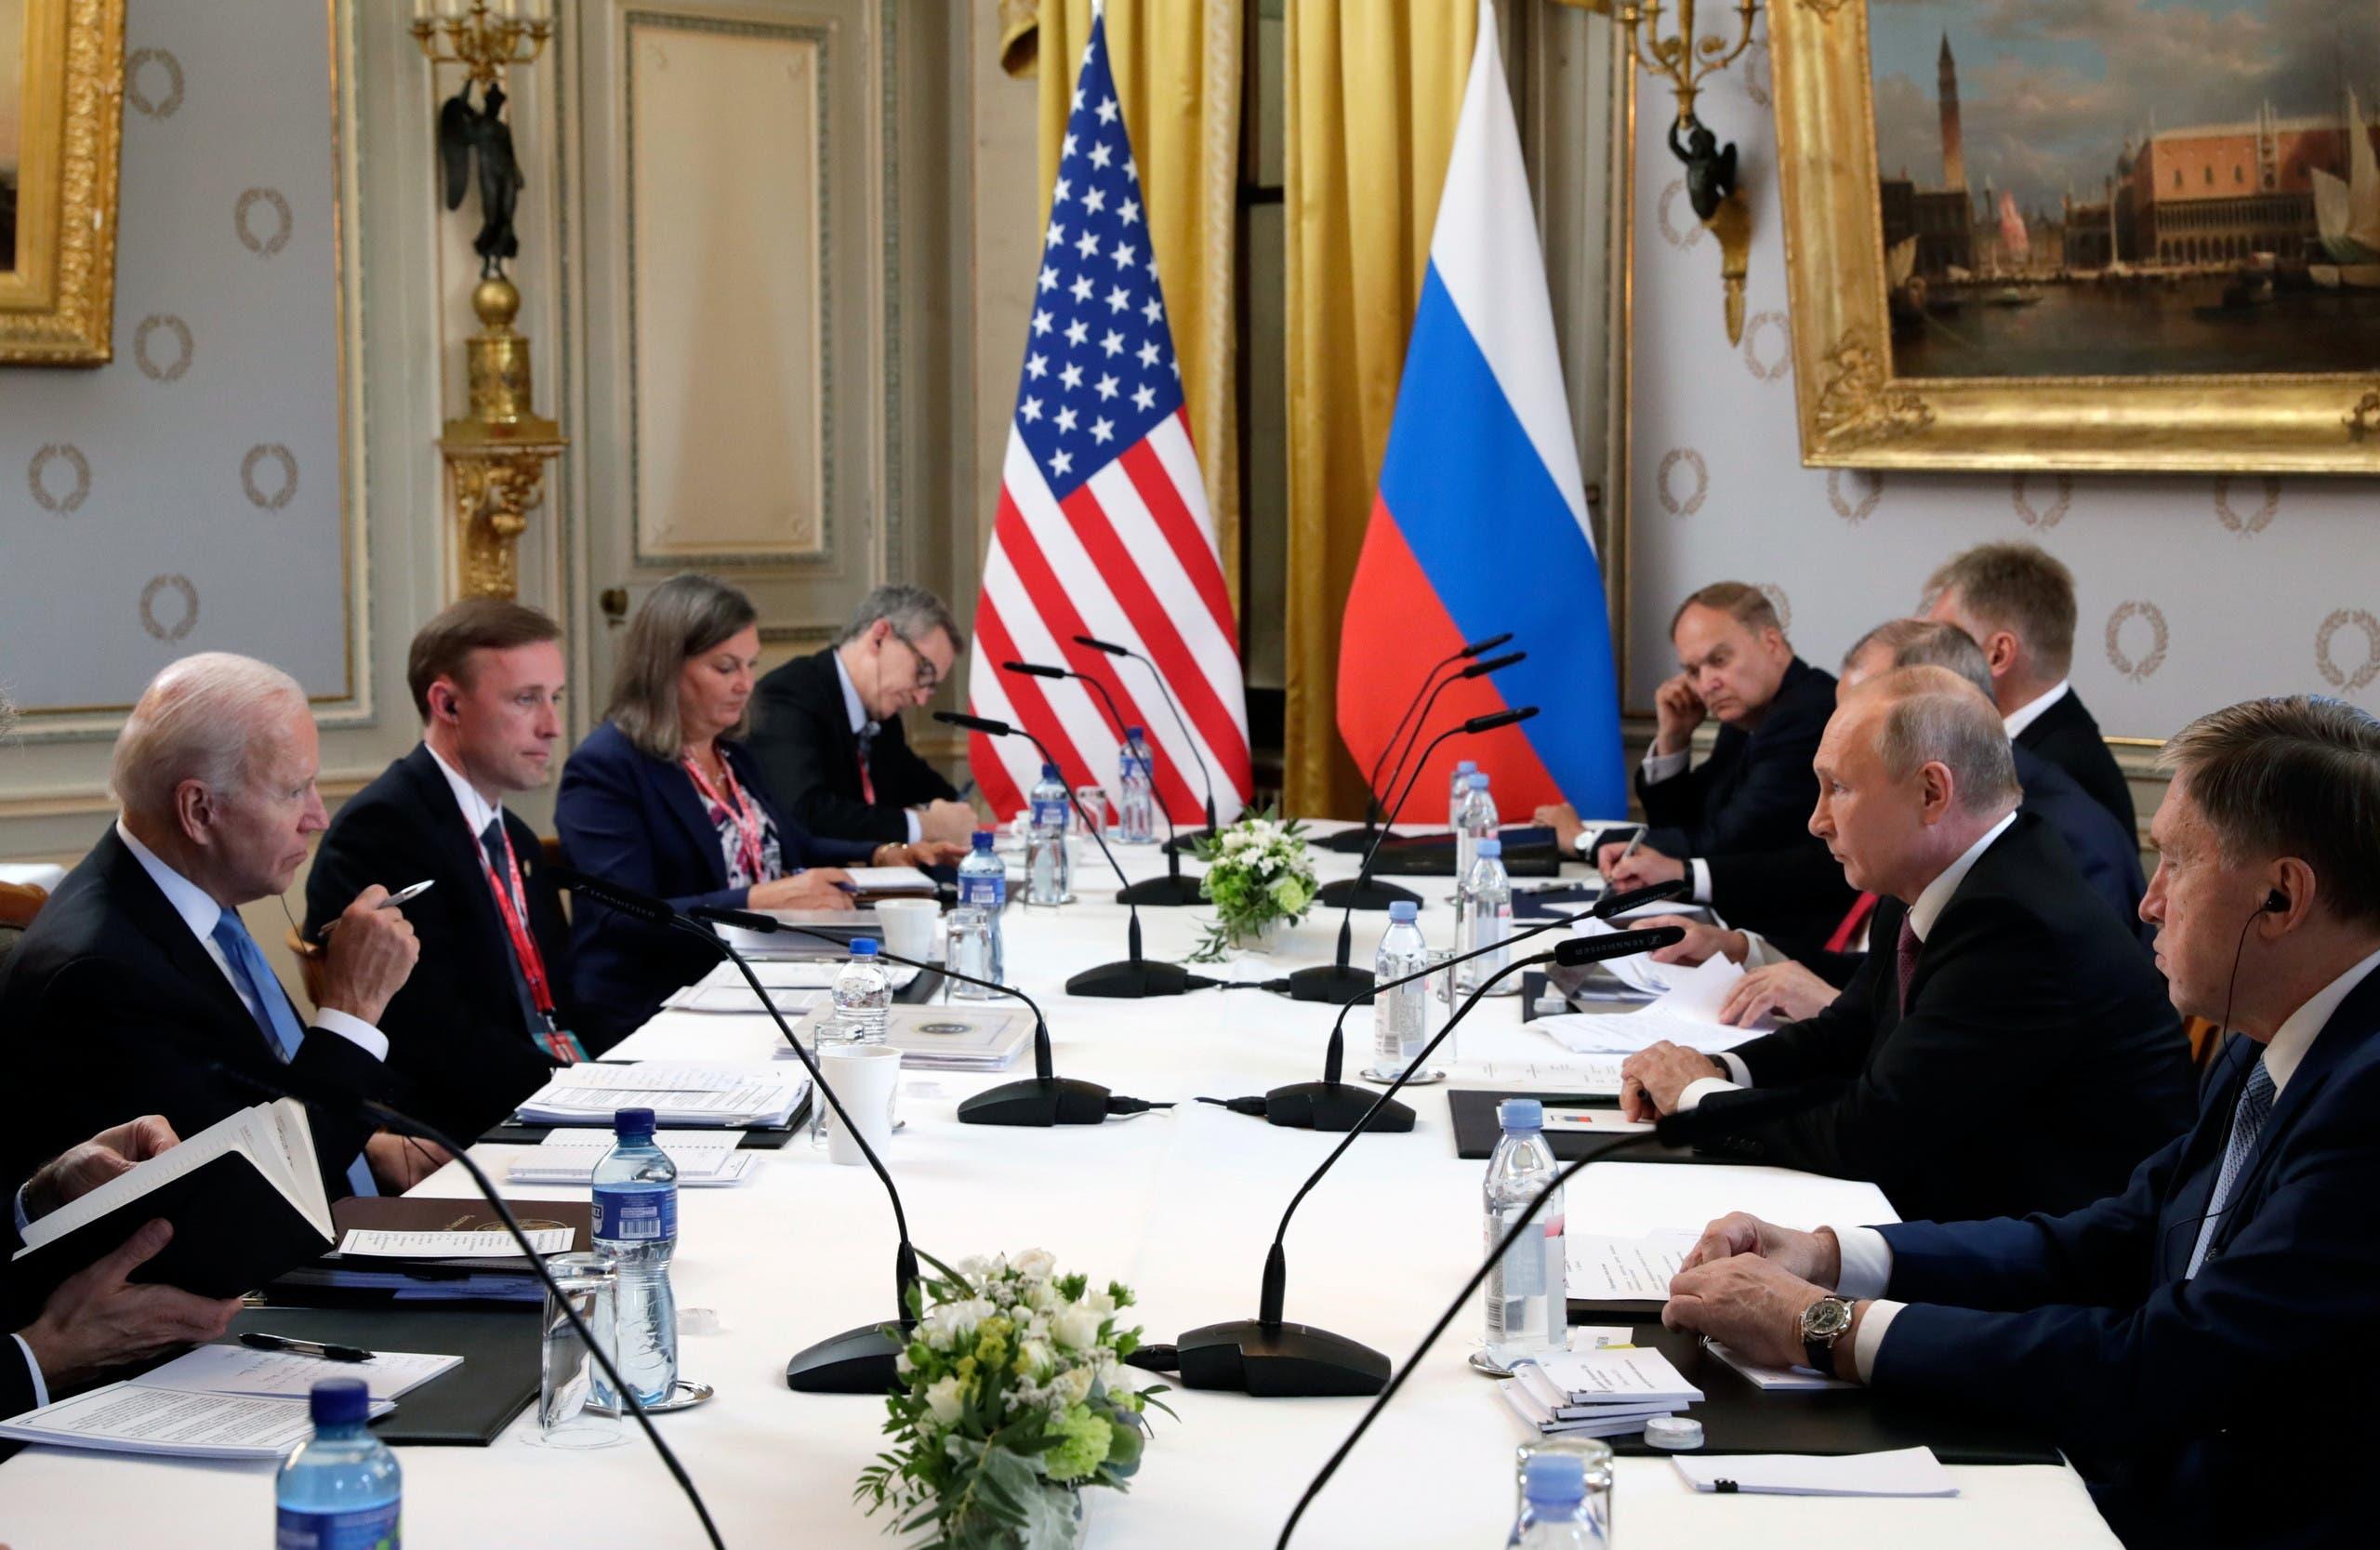 From the Biden and Putin summit yesterday in Geneva